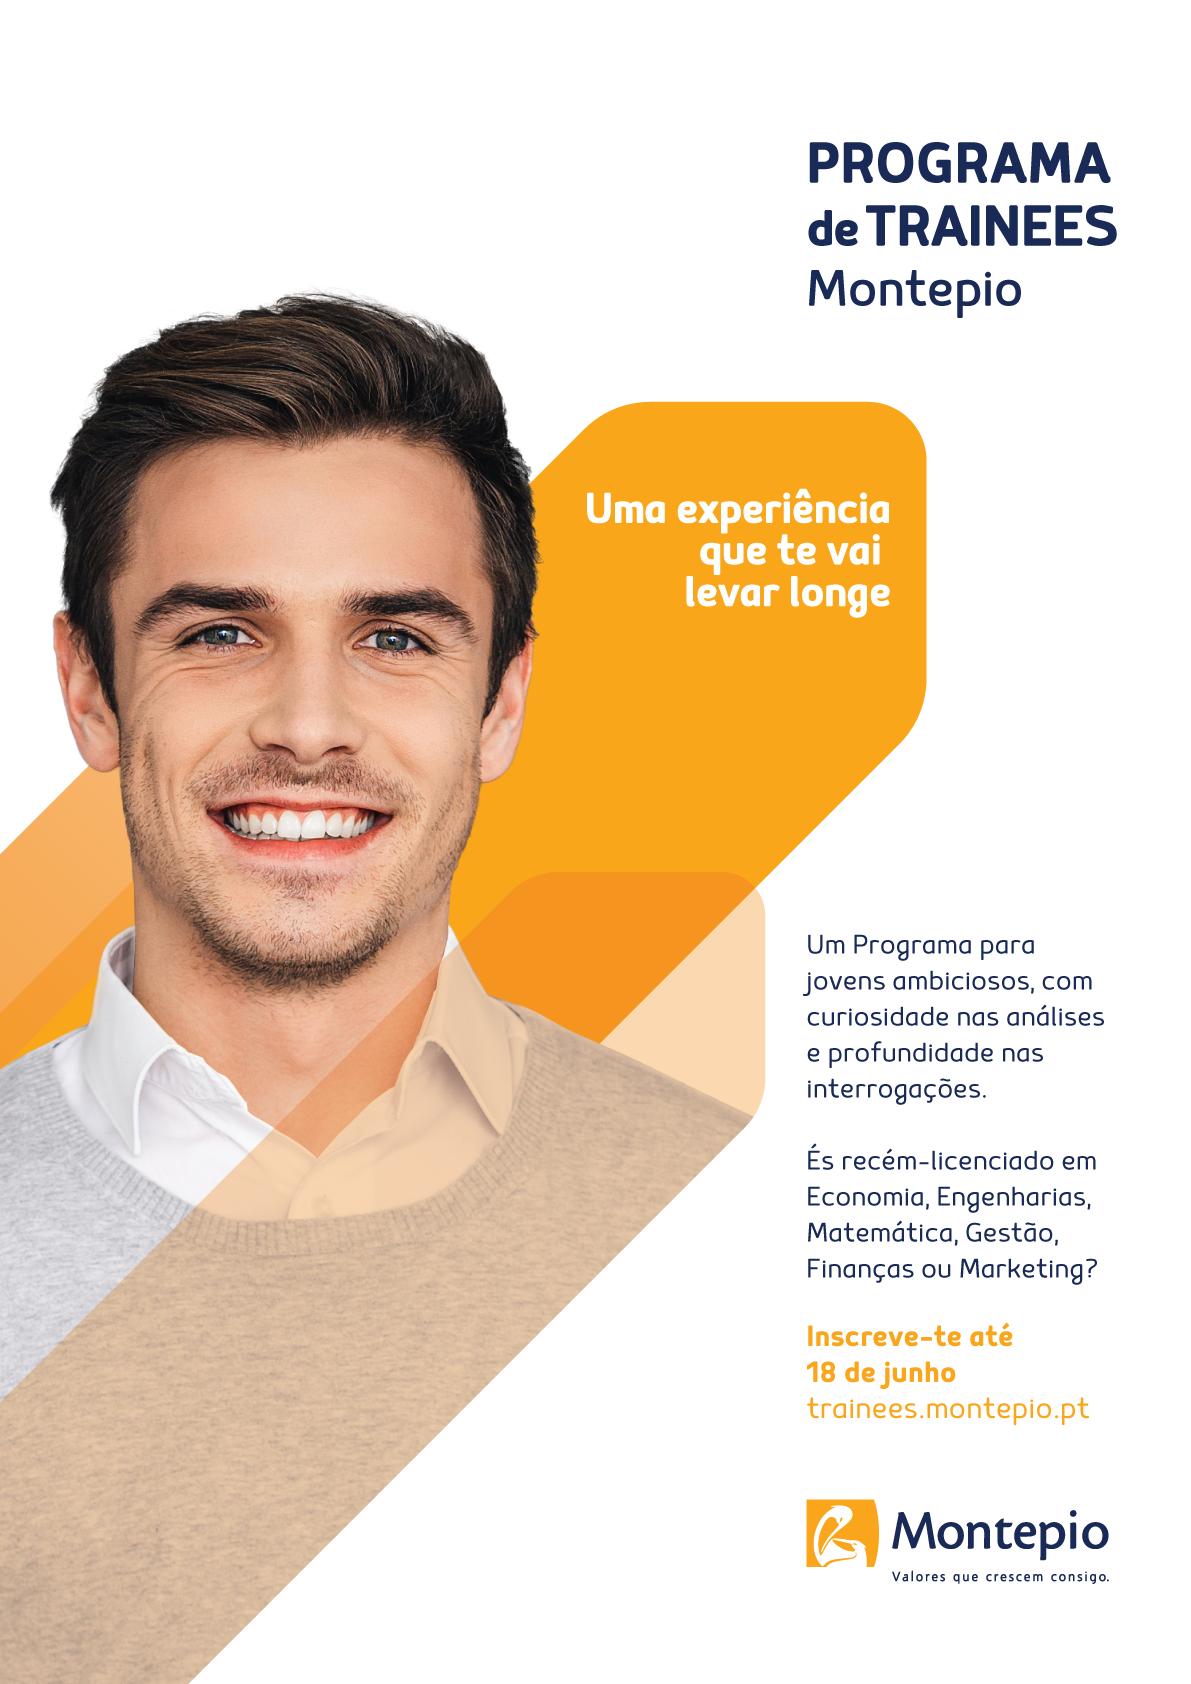 montepio_trainees_cartaz_02_digital-1